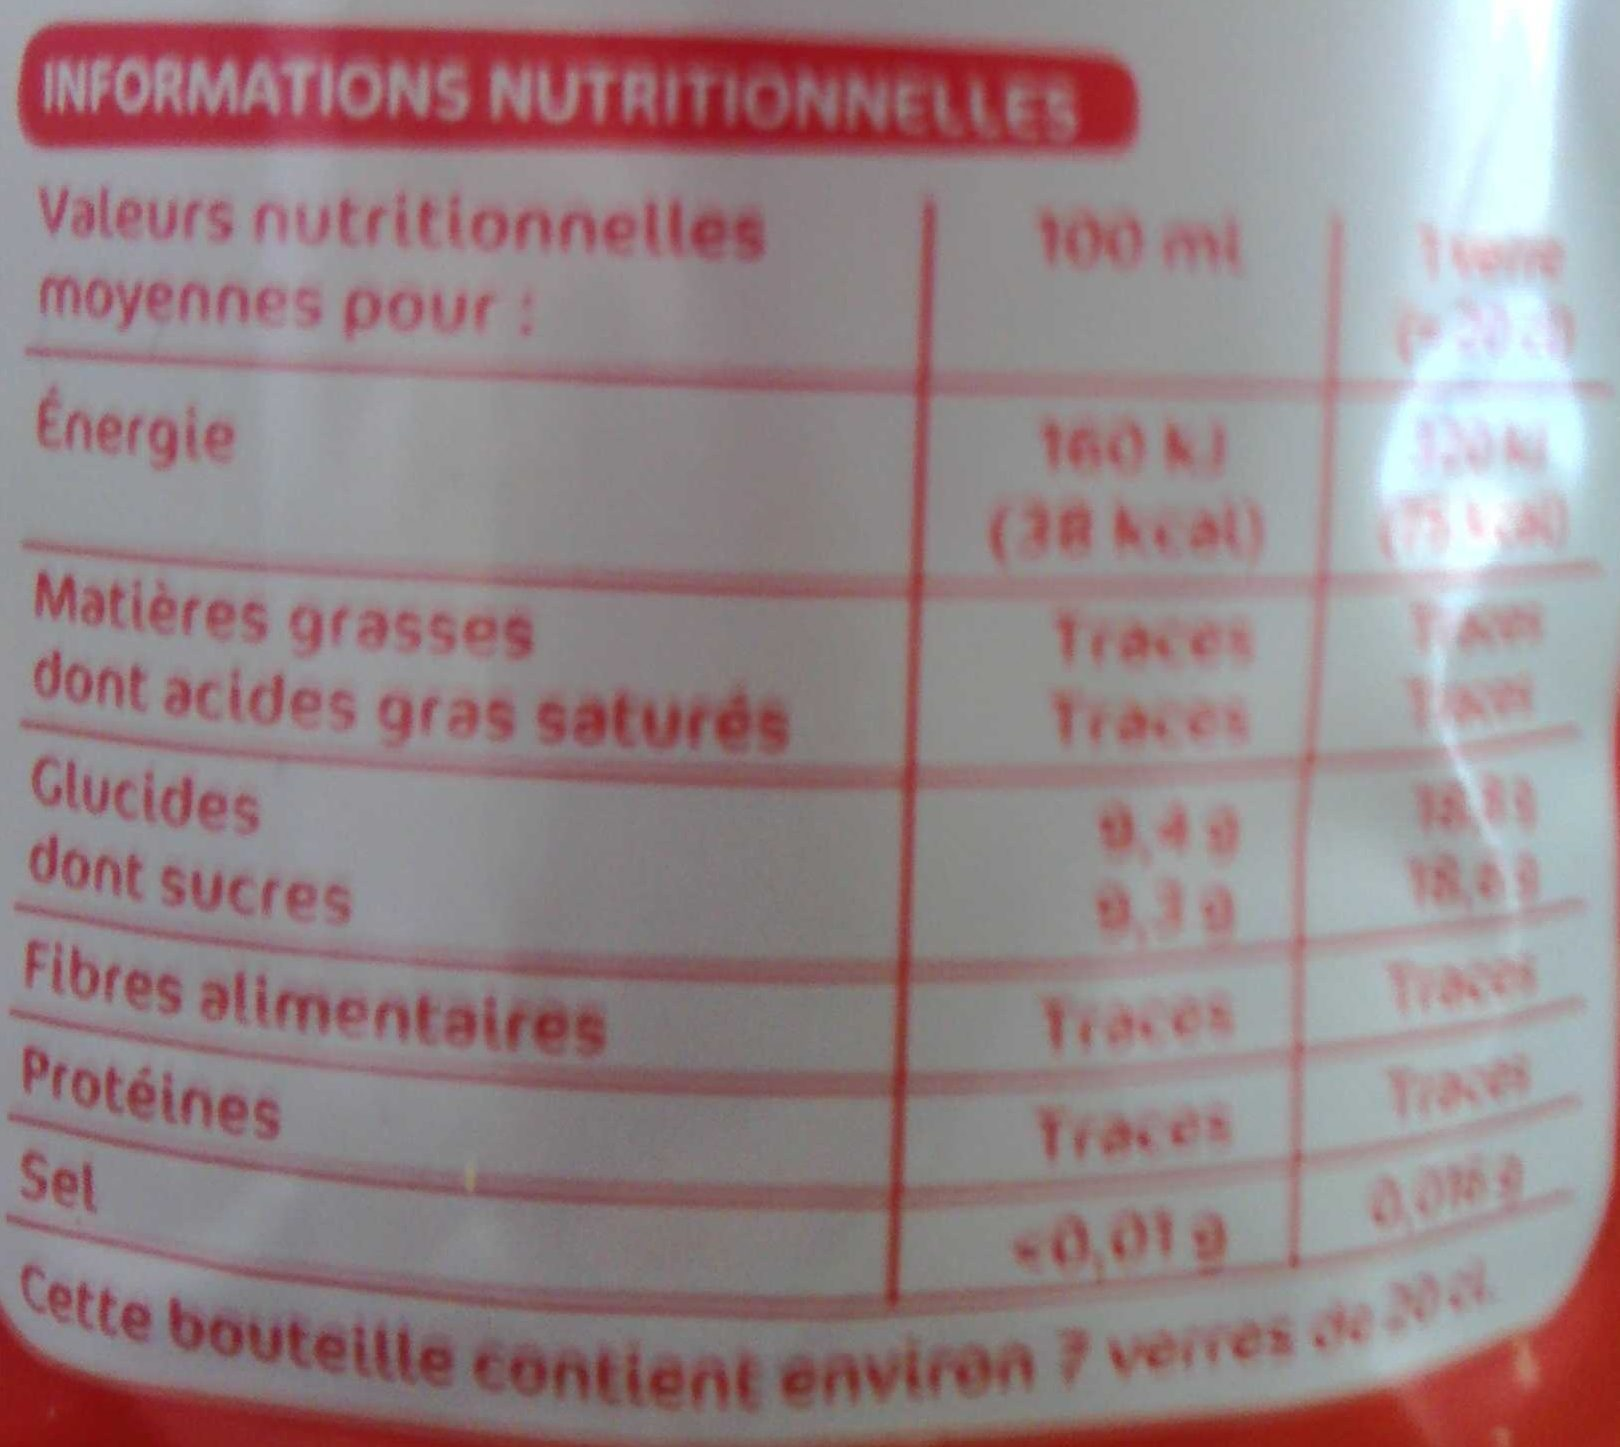 Soda pulpe orange sanguine - Nutrition facts - fr